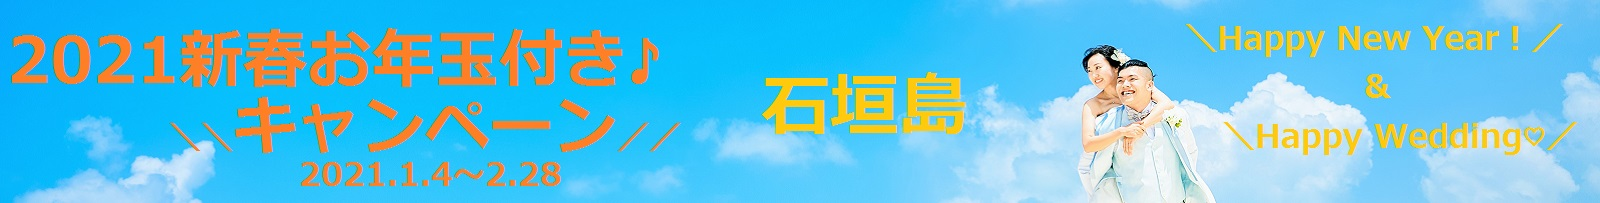 WEB限定ロケーション フォトウェディング ベーシックプラン ~石垣島~